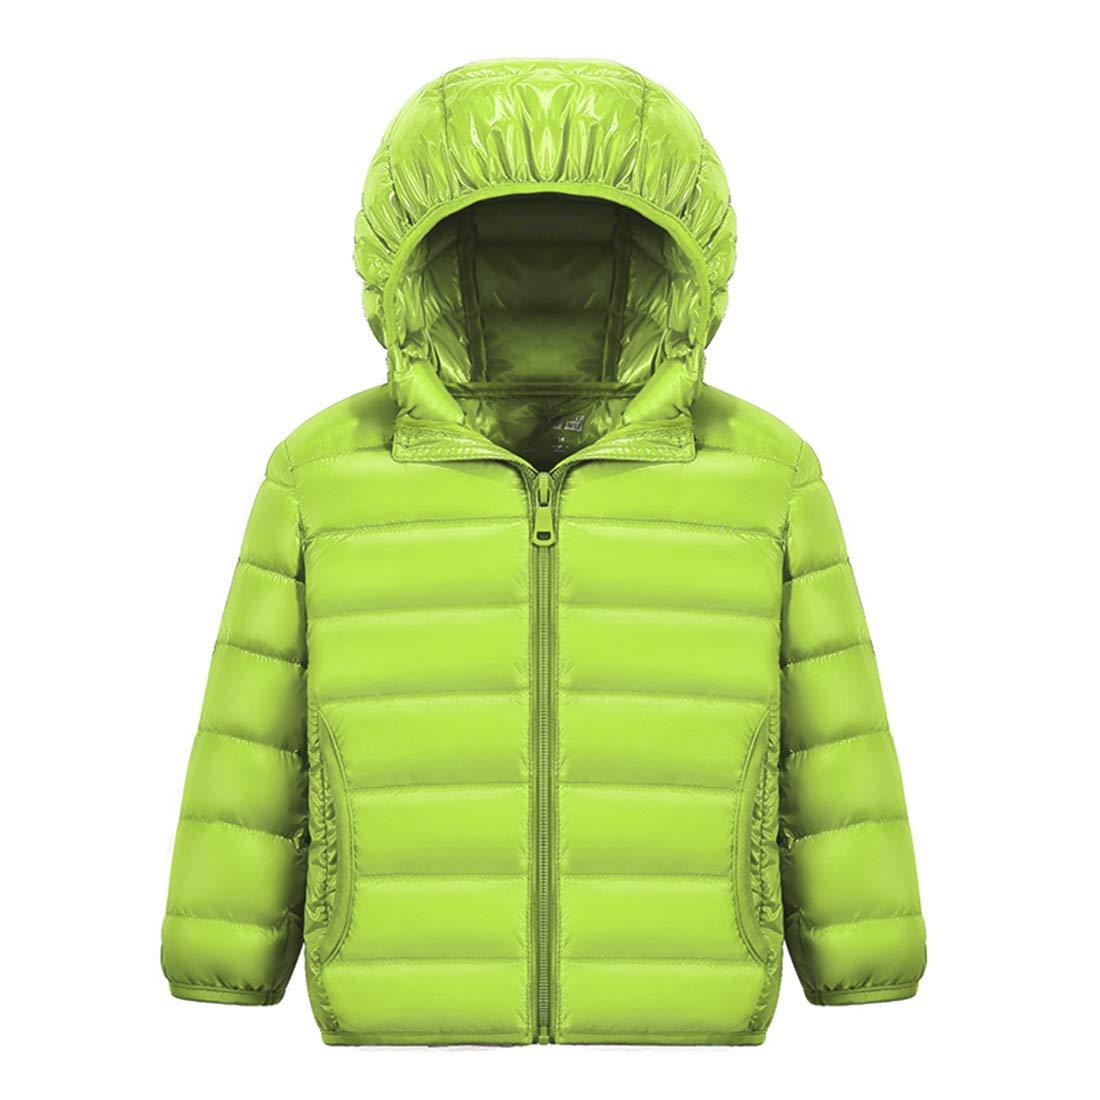 Happy Cherry Boys Quilted Packable Outwear Hoodie Lightweight Comfortable Puffer Jacket Windproof Outwear Children Warm Duck Down Coat Green